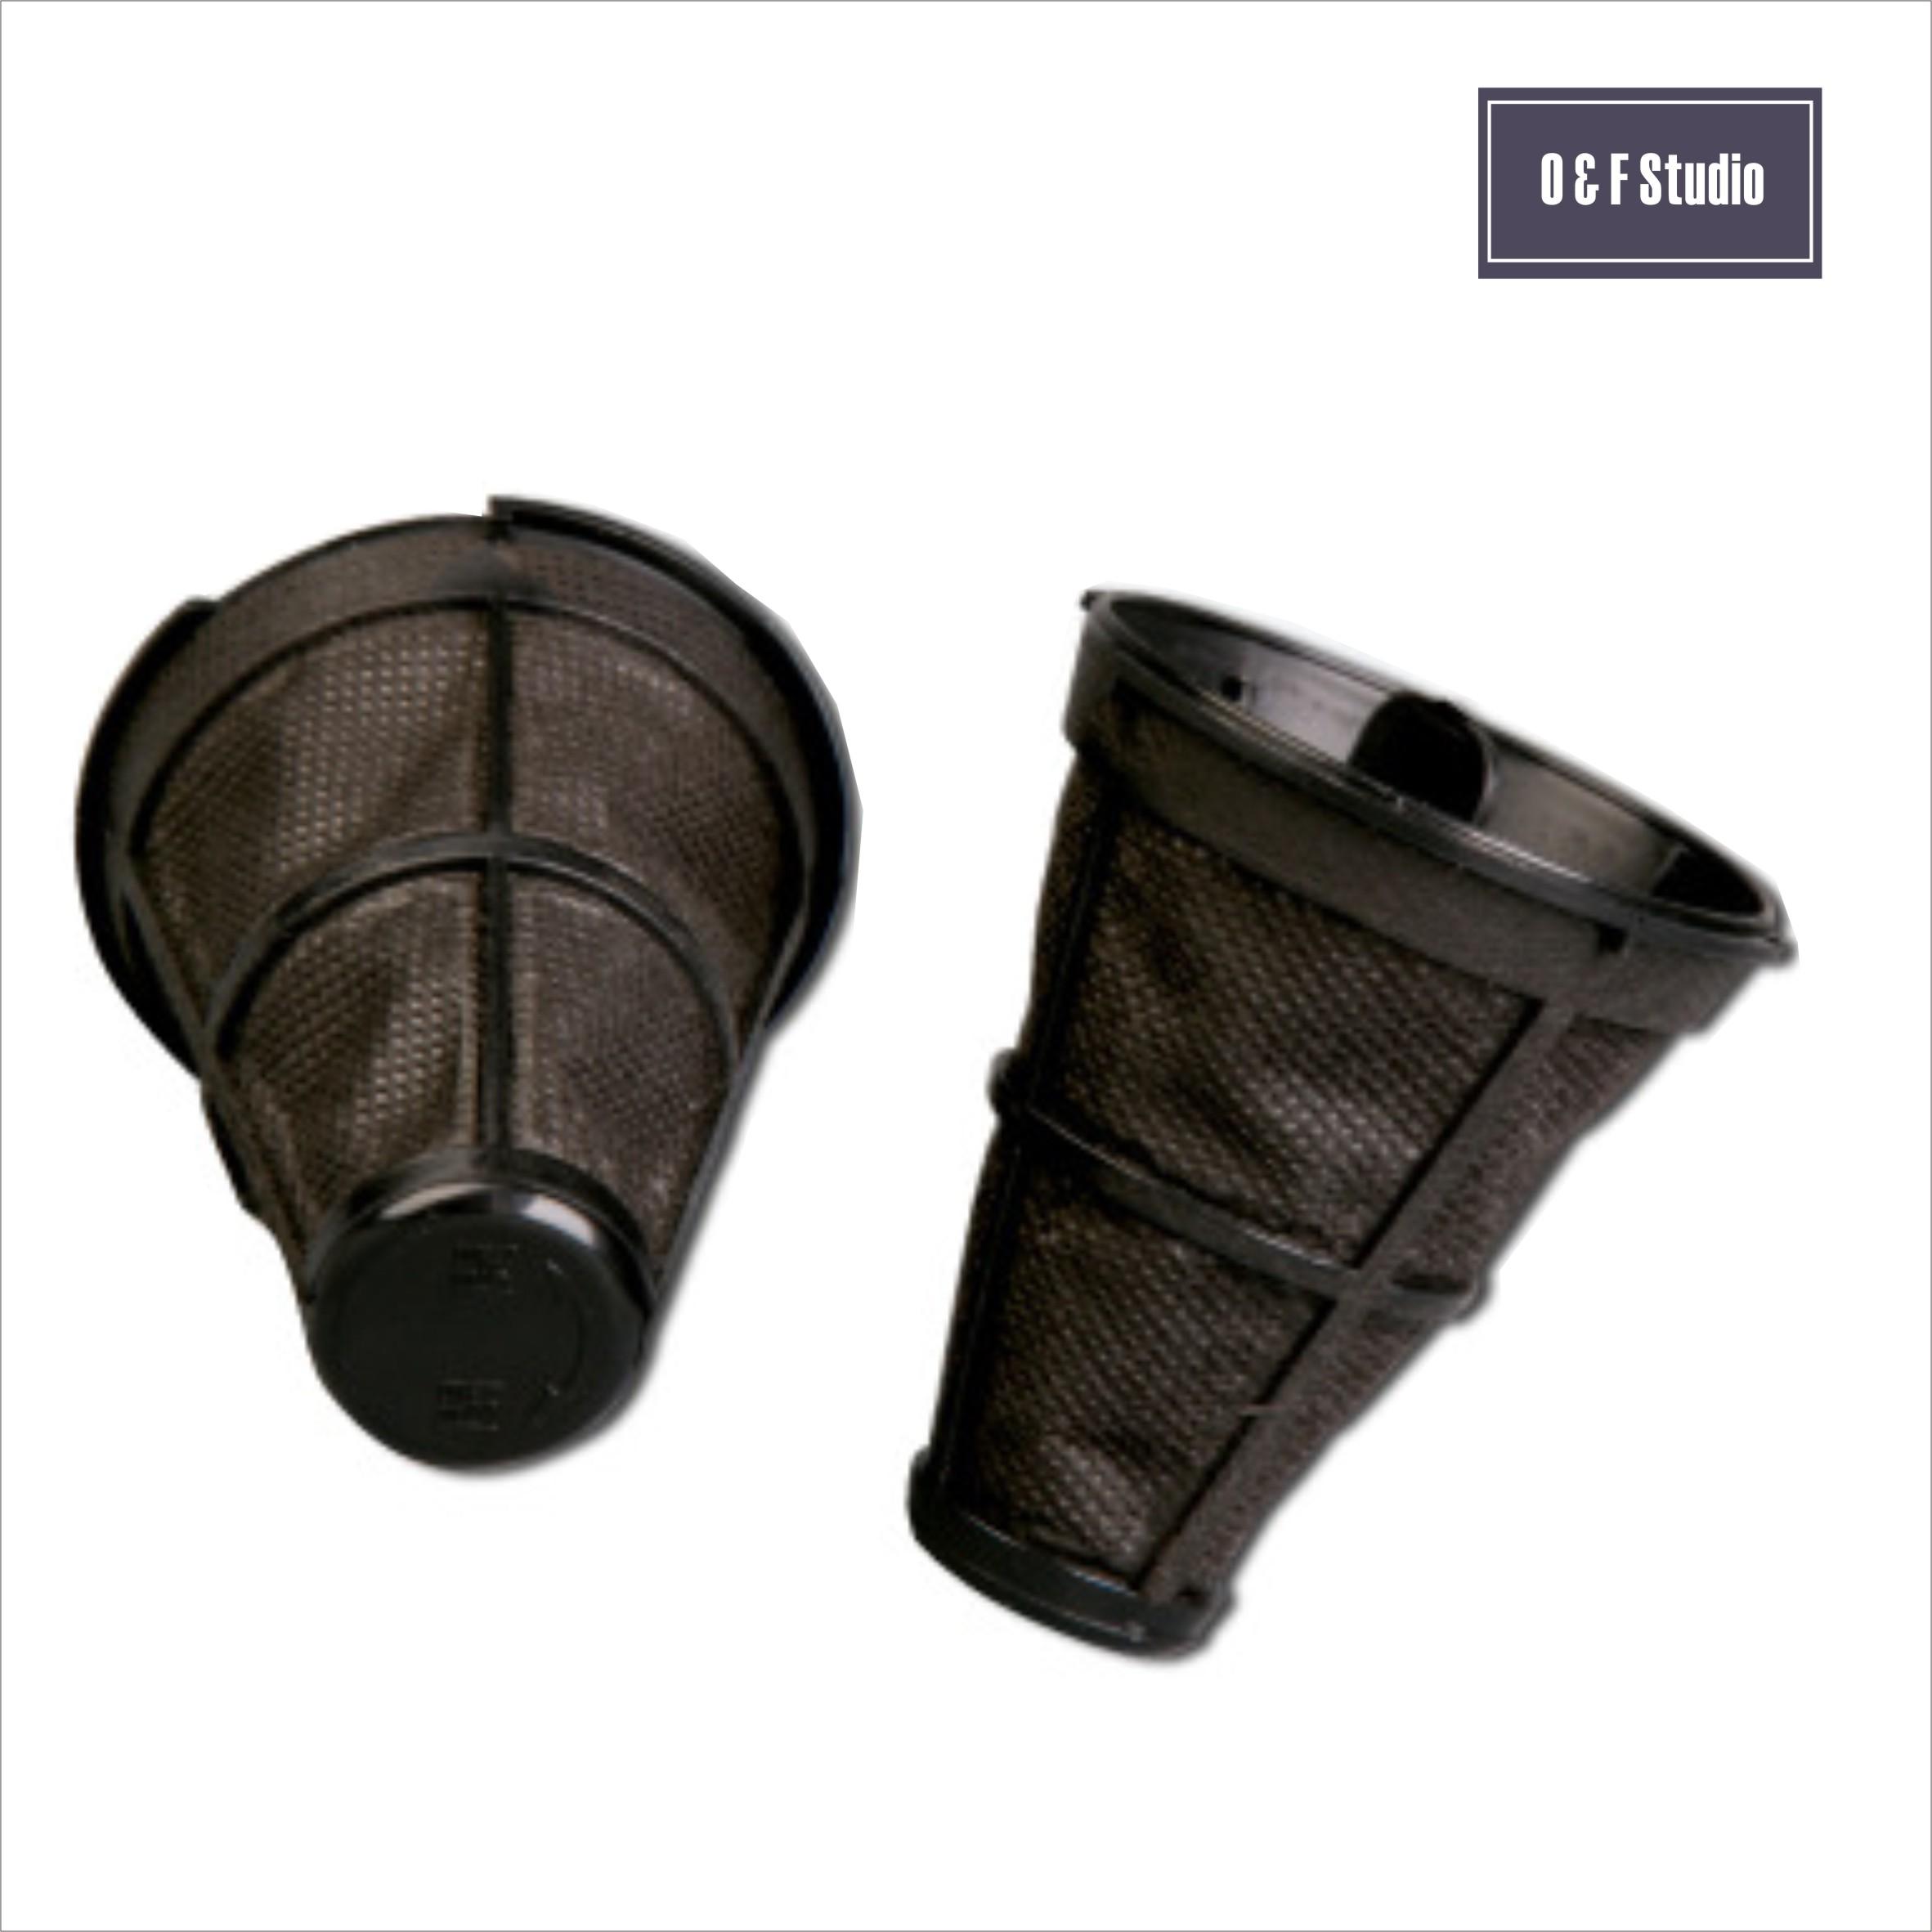 IRIS OHYAMA 除蟎吸塵器IC-FAC2 專用集塵濾網 CF-FS2 (1入)【居家達人 IRS02】